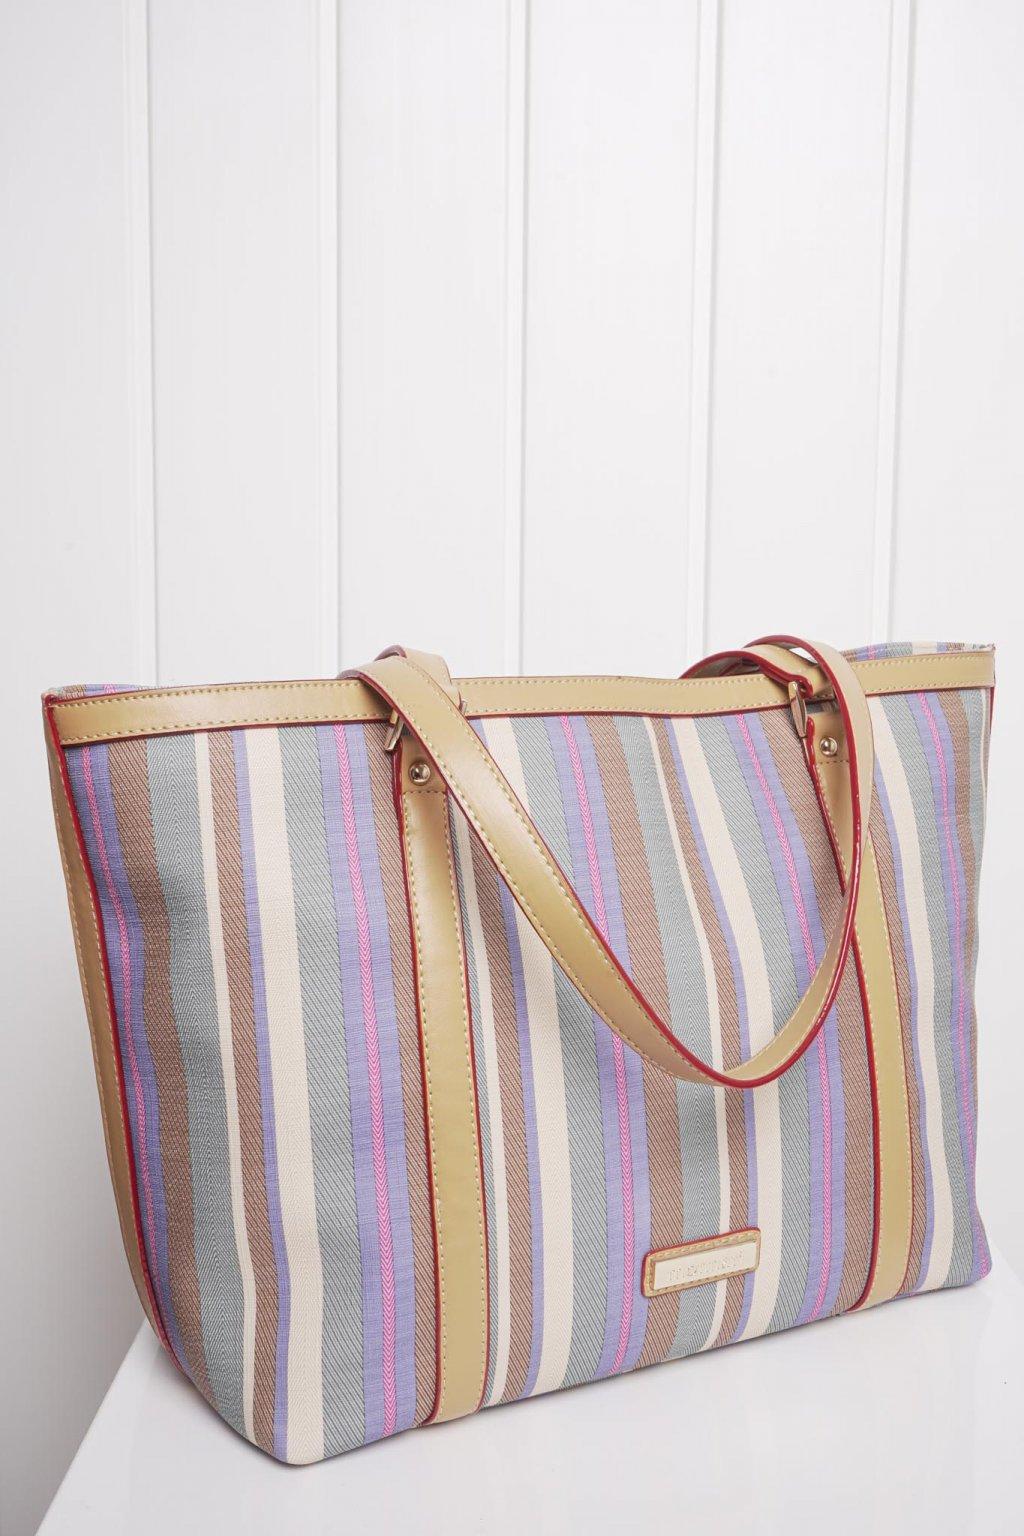 Kabelka, ruksak, dobrá cena, čierna kabelka, čierny ruksak, basic, kabelky, ruksaky 134